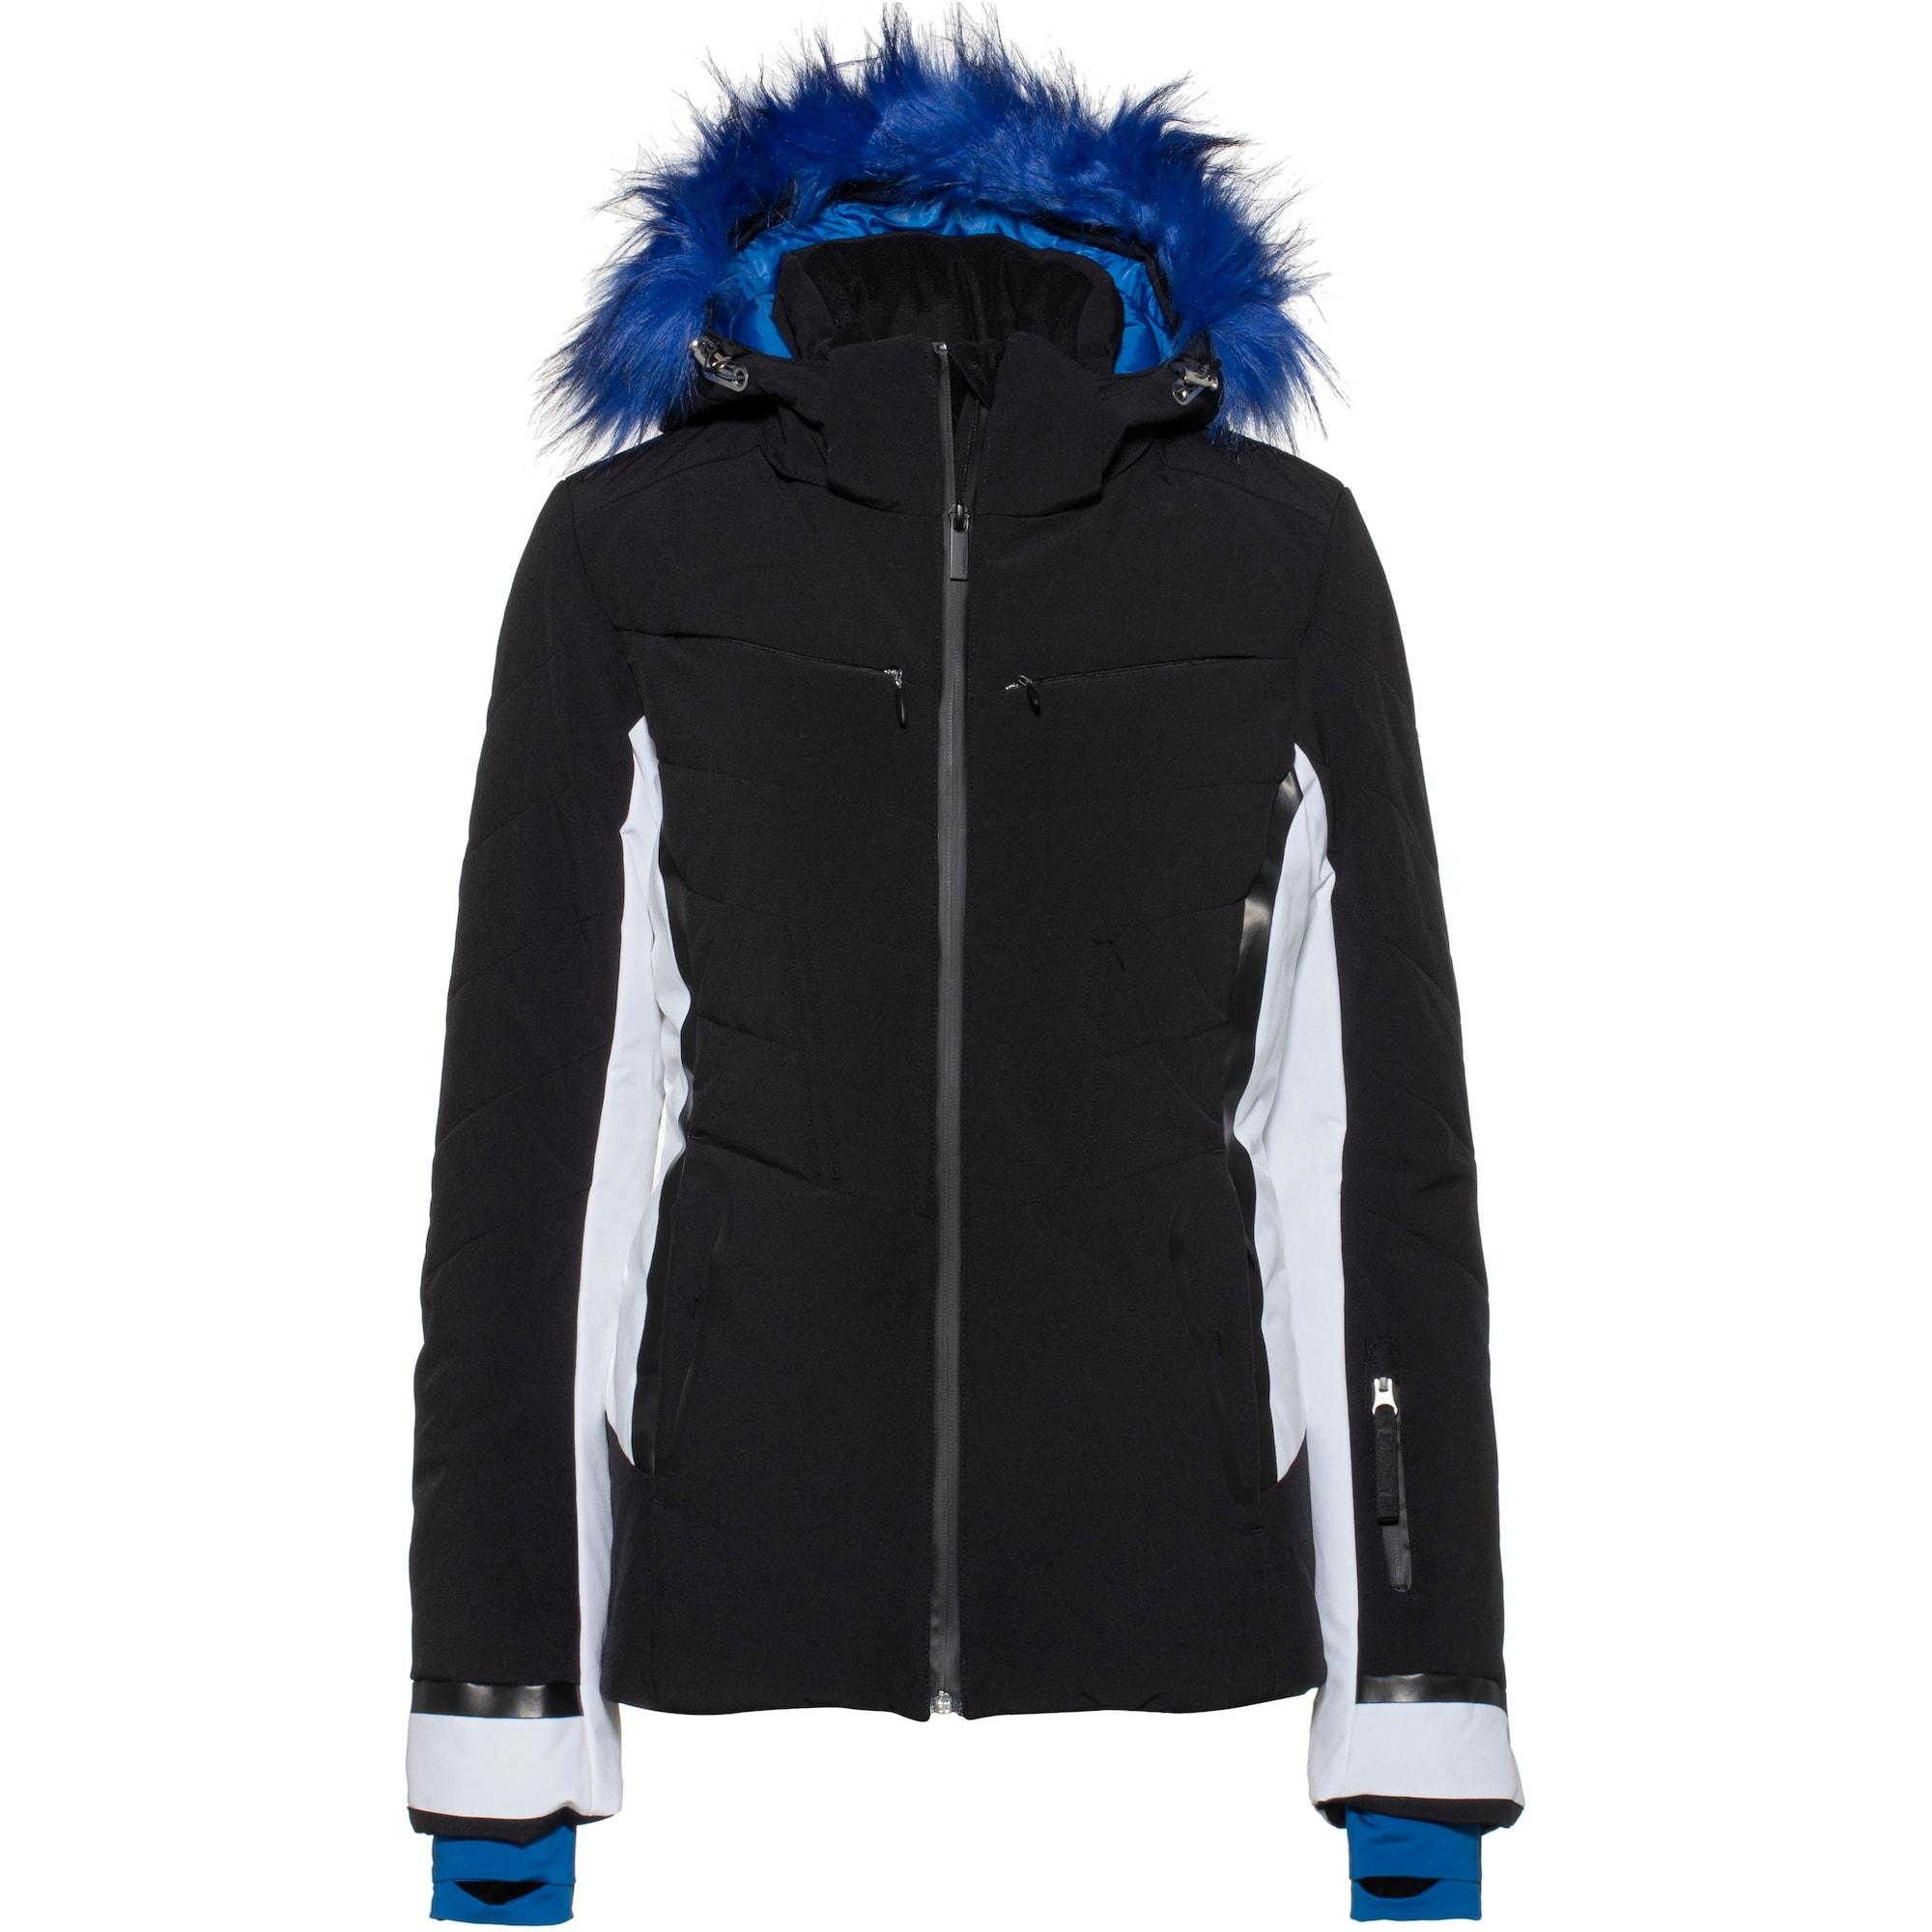 Skijacke 'Elaine' | Sportbekleidung > Sportjacken > Skijacken | icepeak